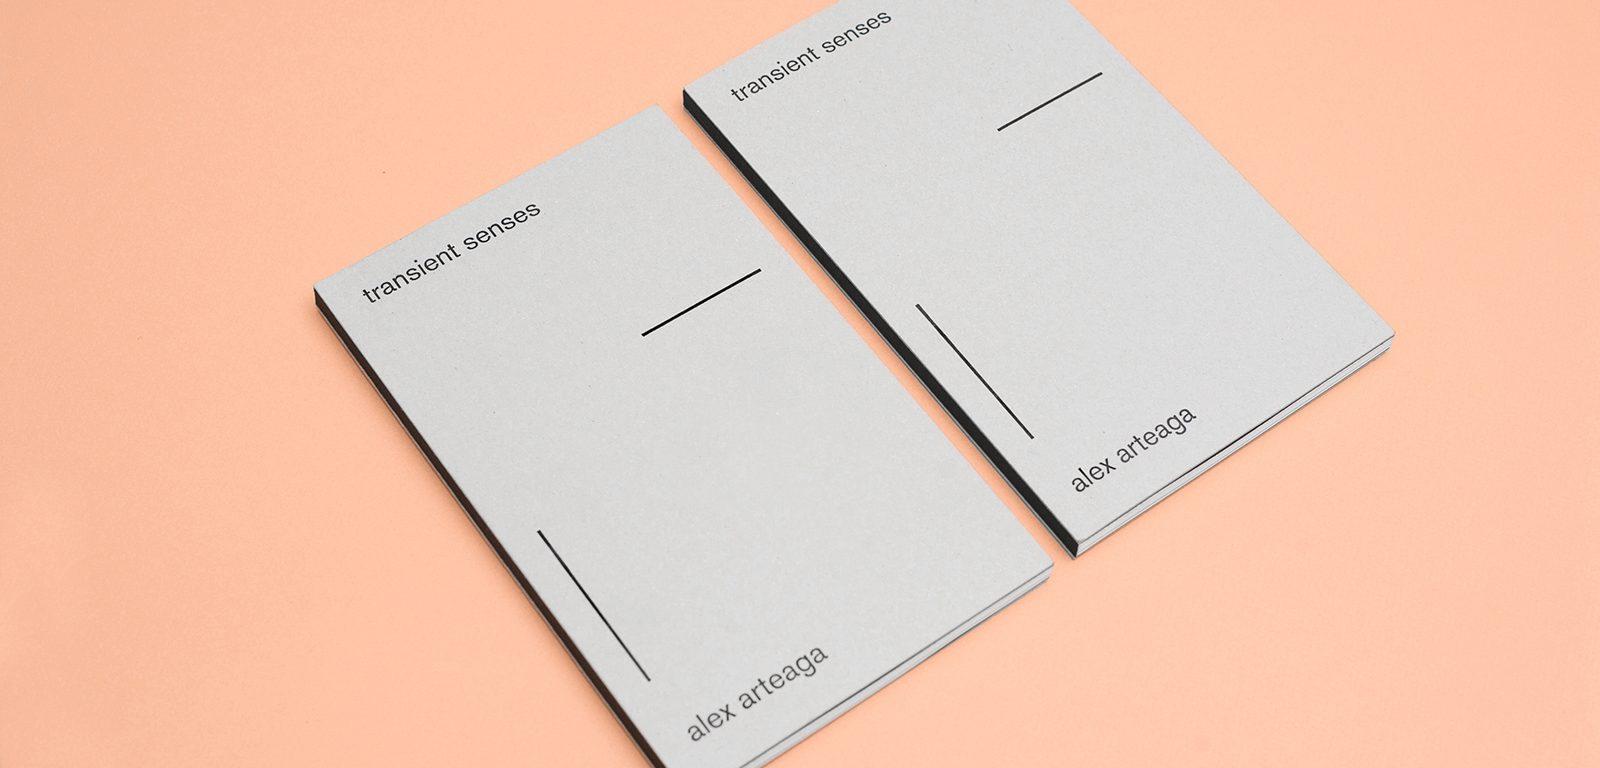 Todojunto — Transient Senses - Publication